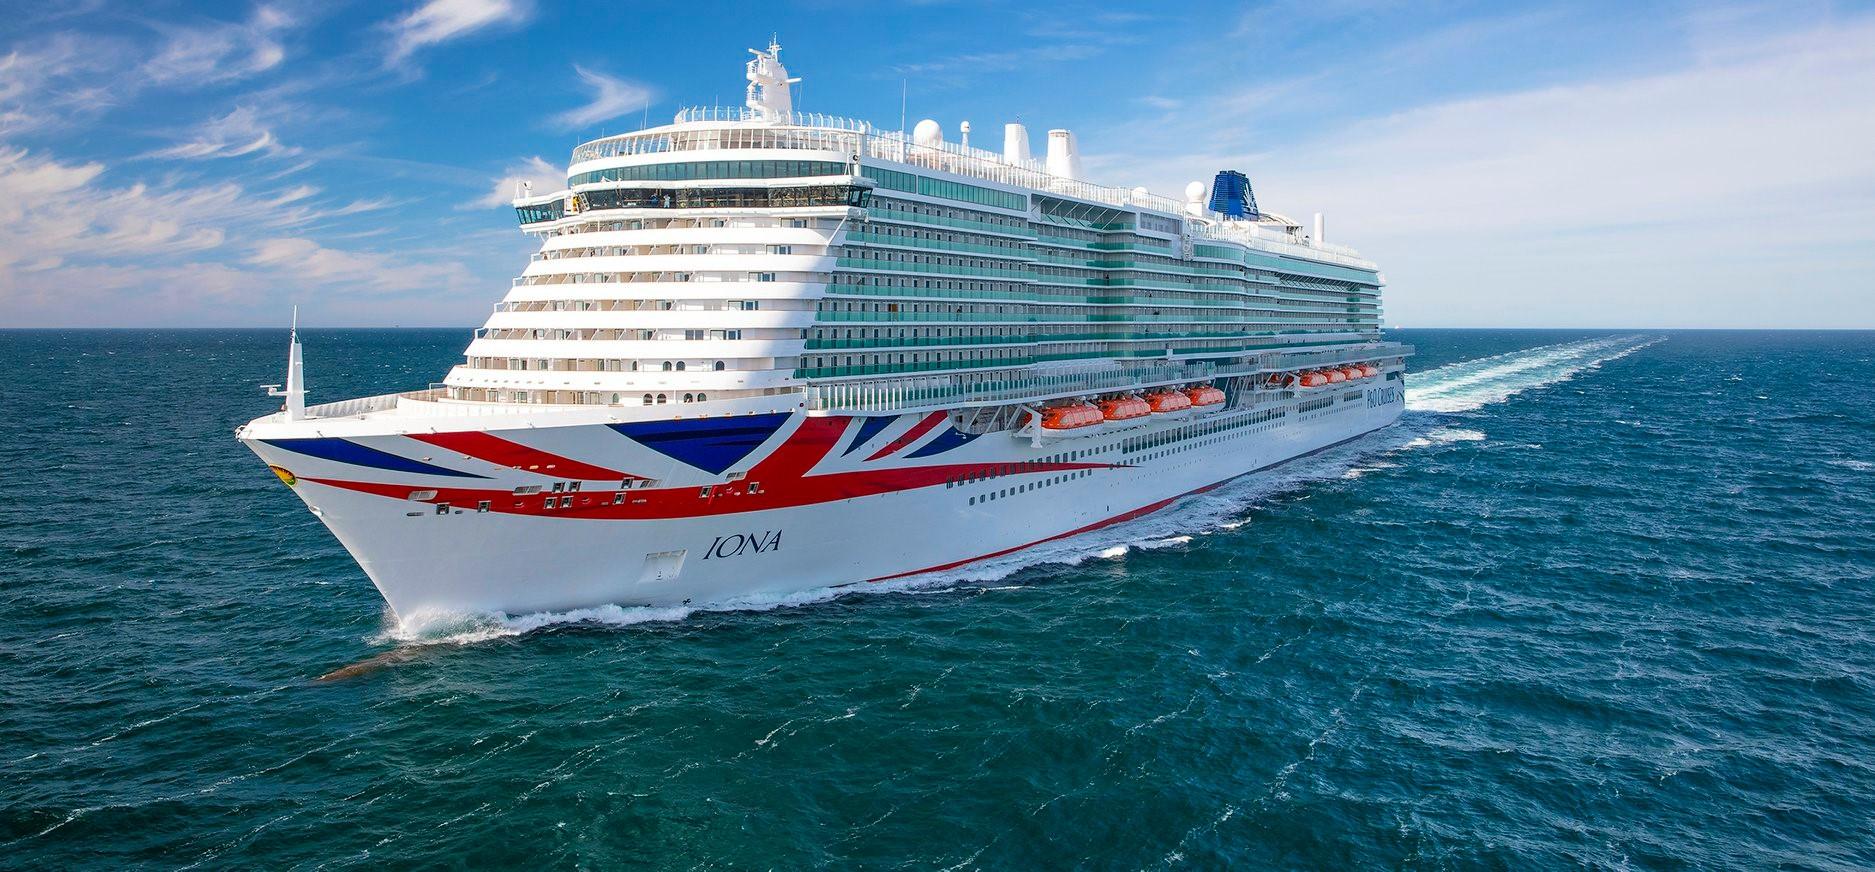 kreuzfahrtschiff-iona-maritime-projekte